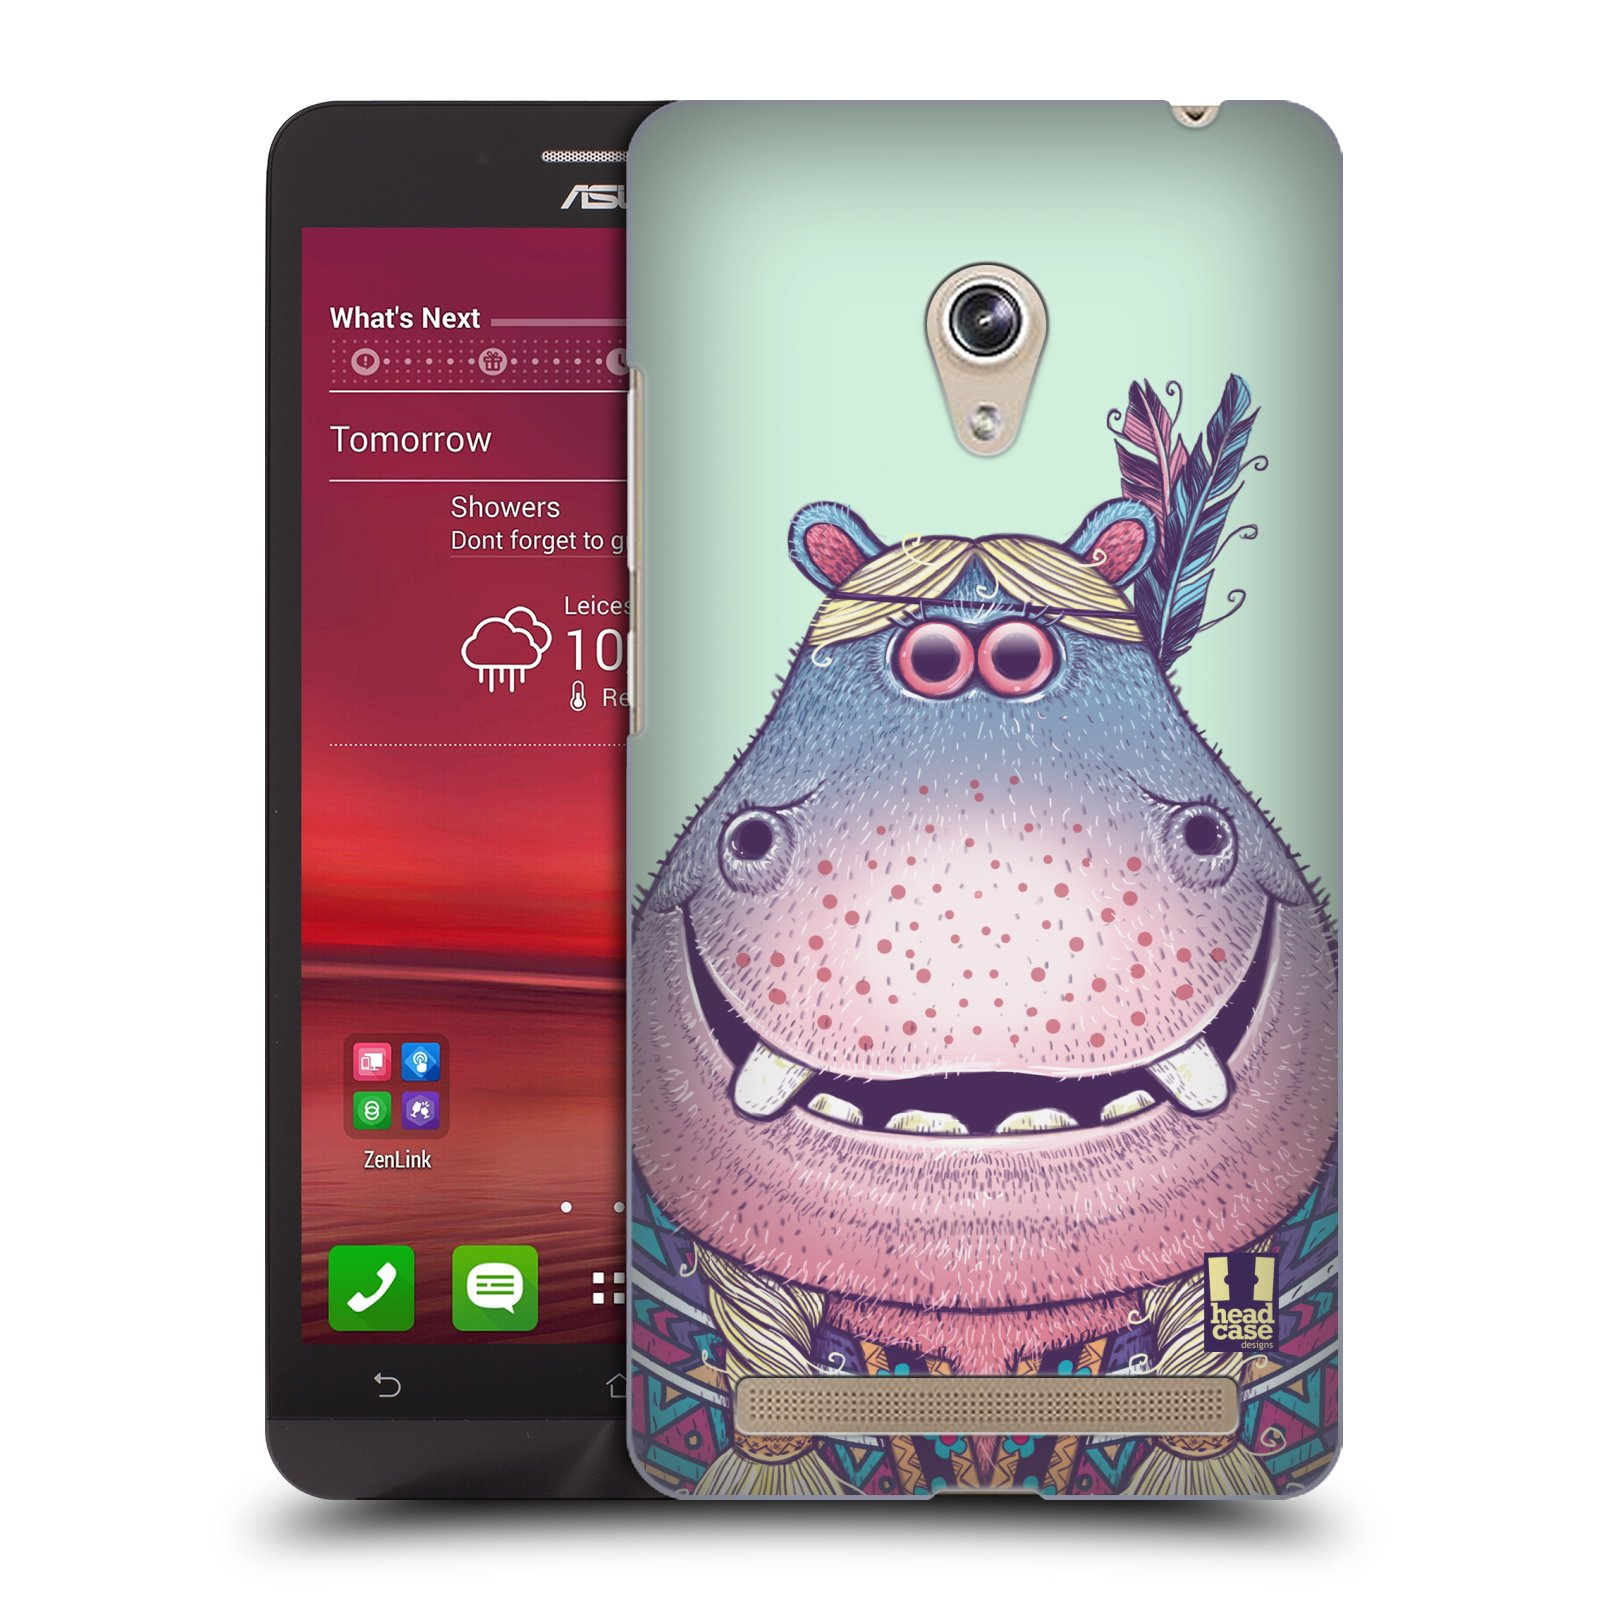 HEAD CASE plastový obal na mobil Asus Zenfone 6 vzor Kreslená zvířátka hroch